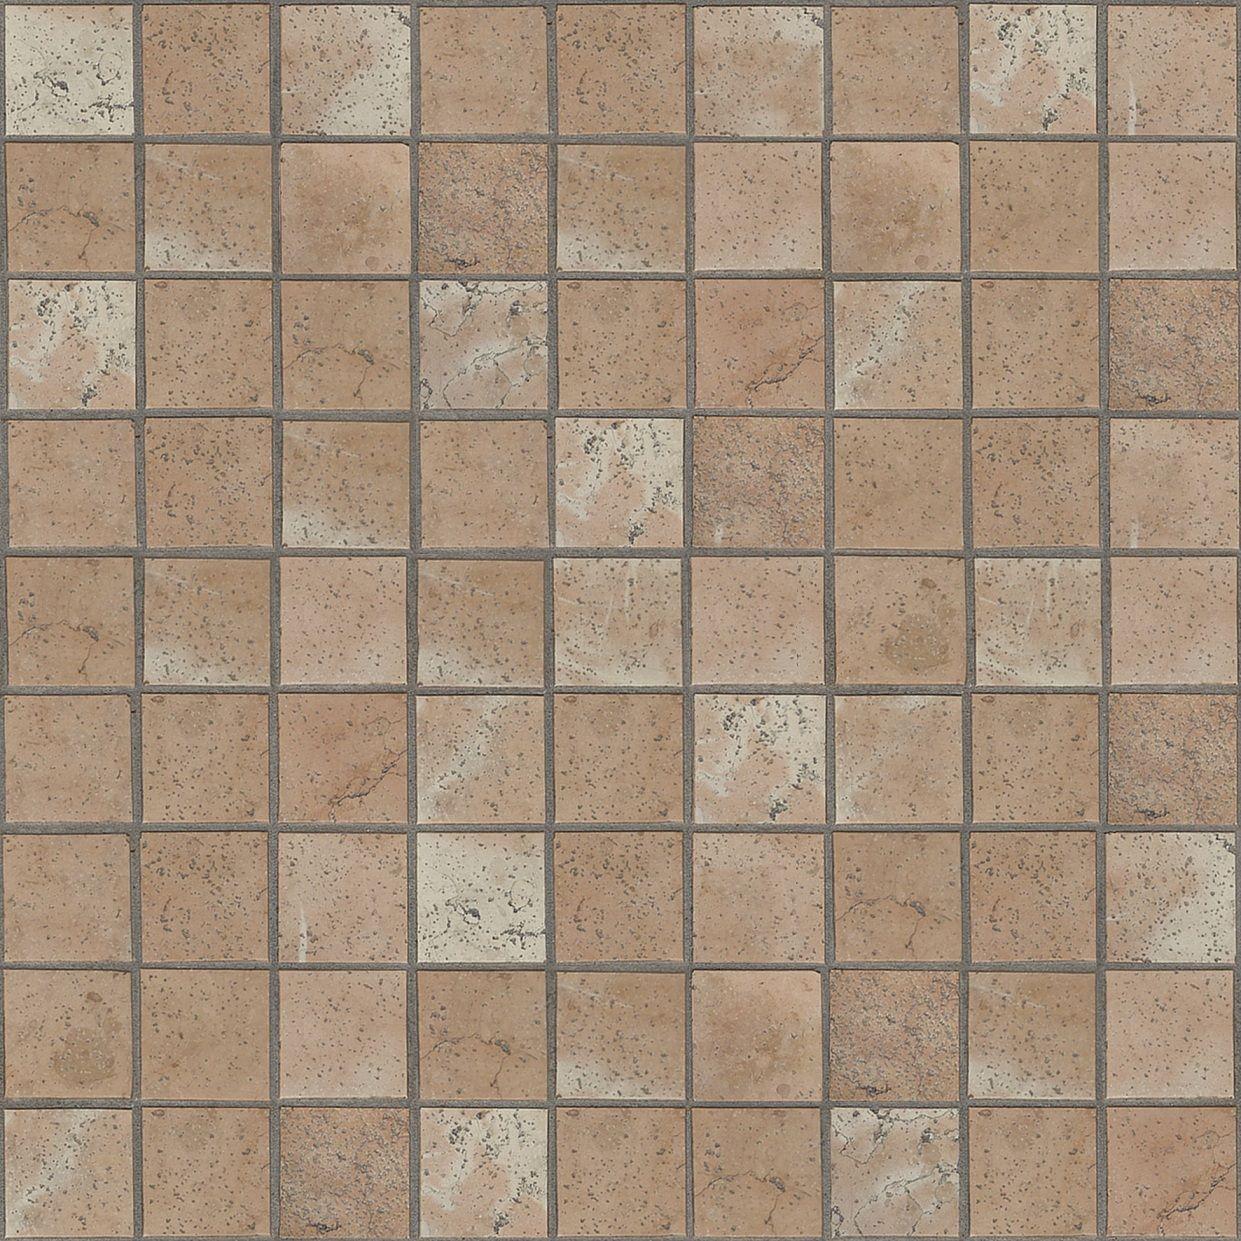 Bathroom Floor Tile Texture Seamless Piastrelle Piastrelle